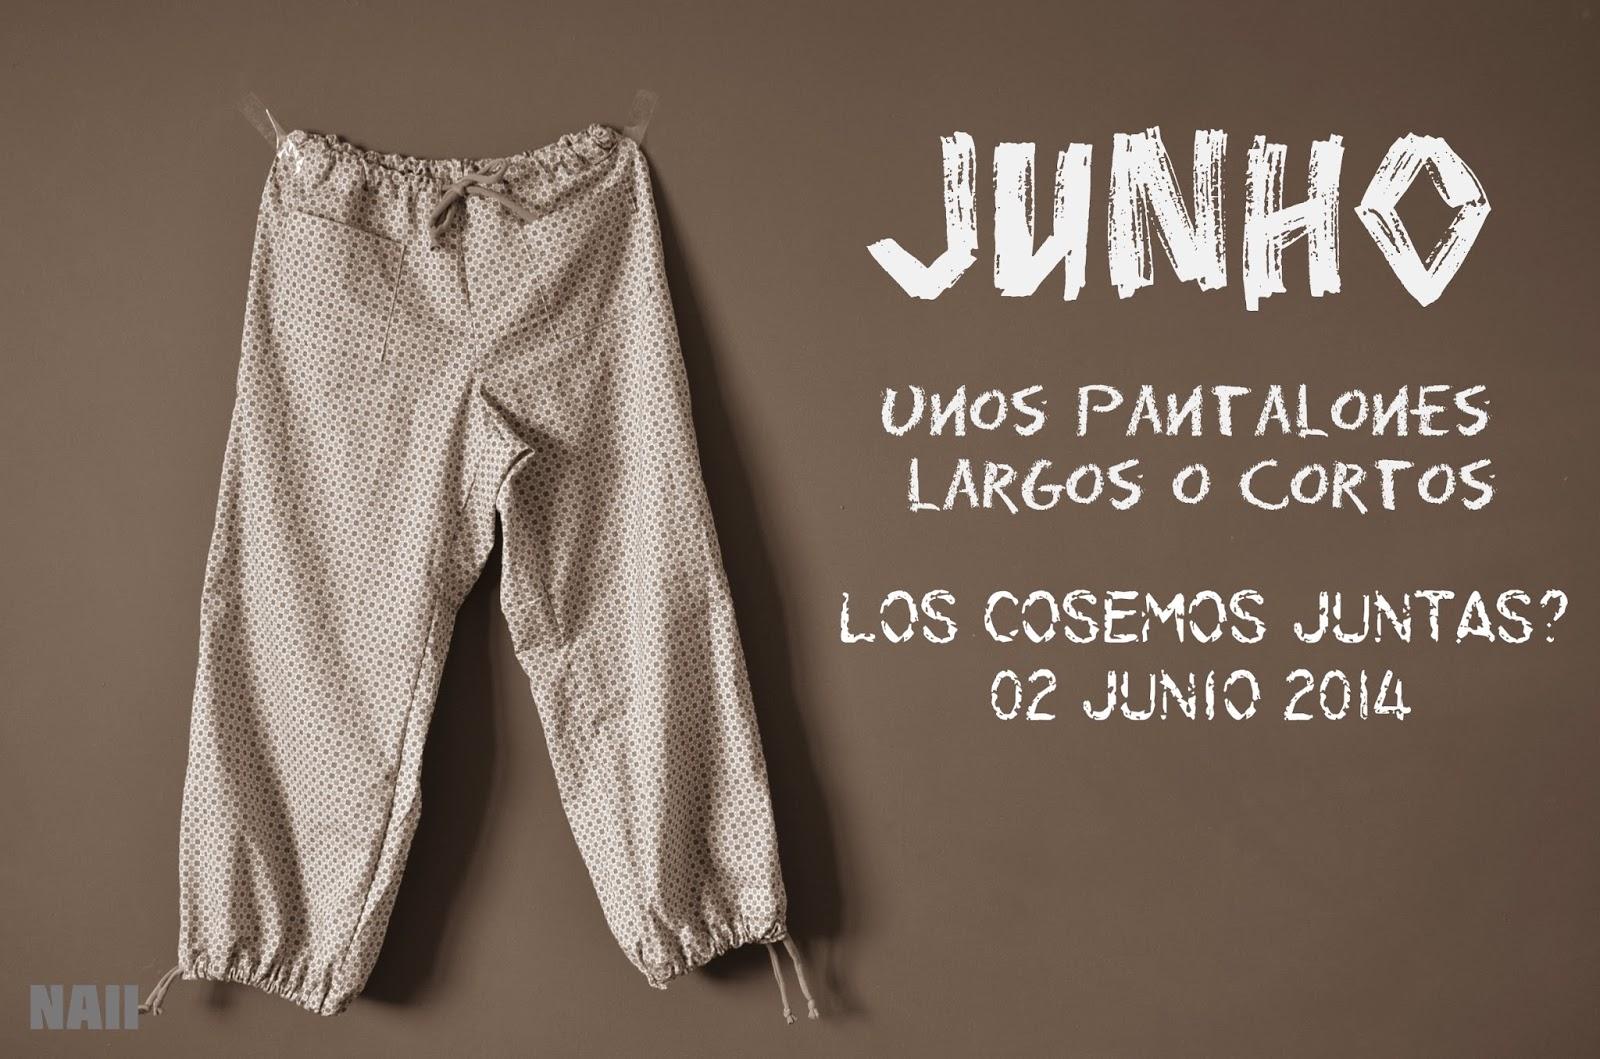 CC Pantalones Junho